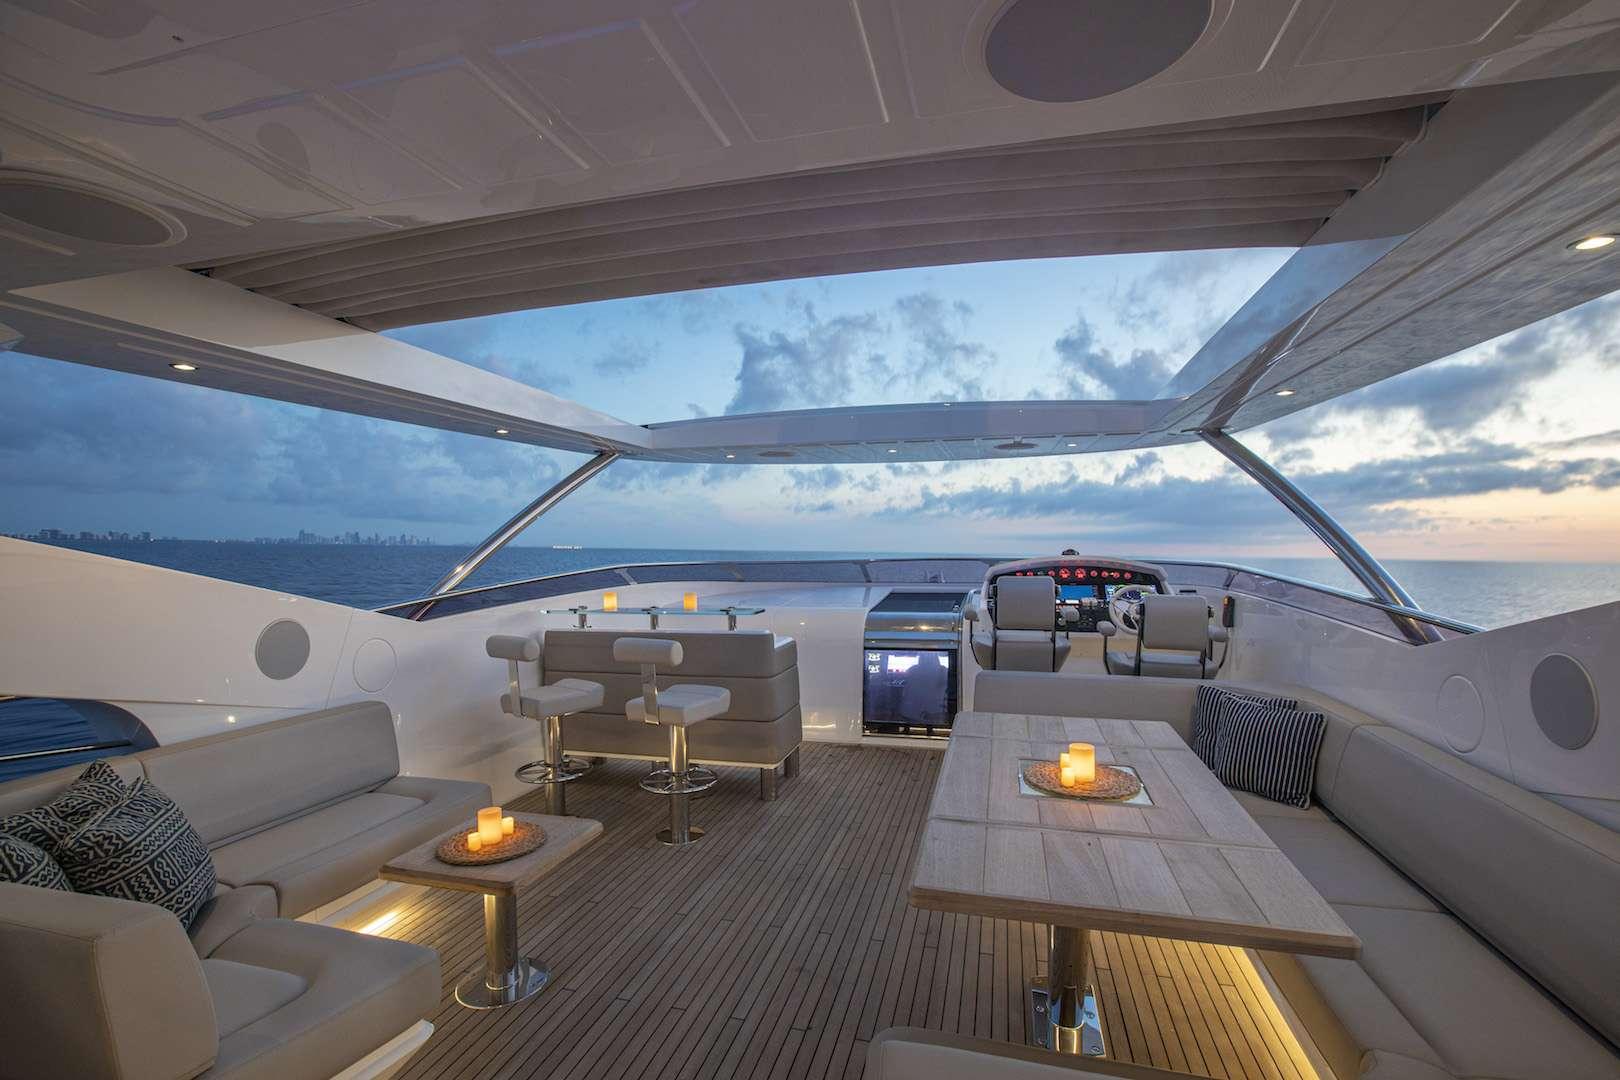 Alquiler de barcos en Ibiza. Aquiler de yates en Ibiza. Barcos baratos de alquiler en Ibiza